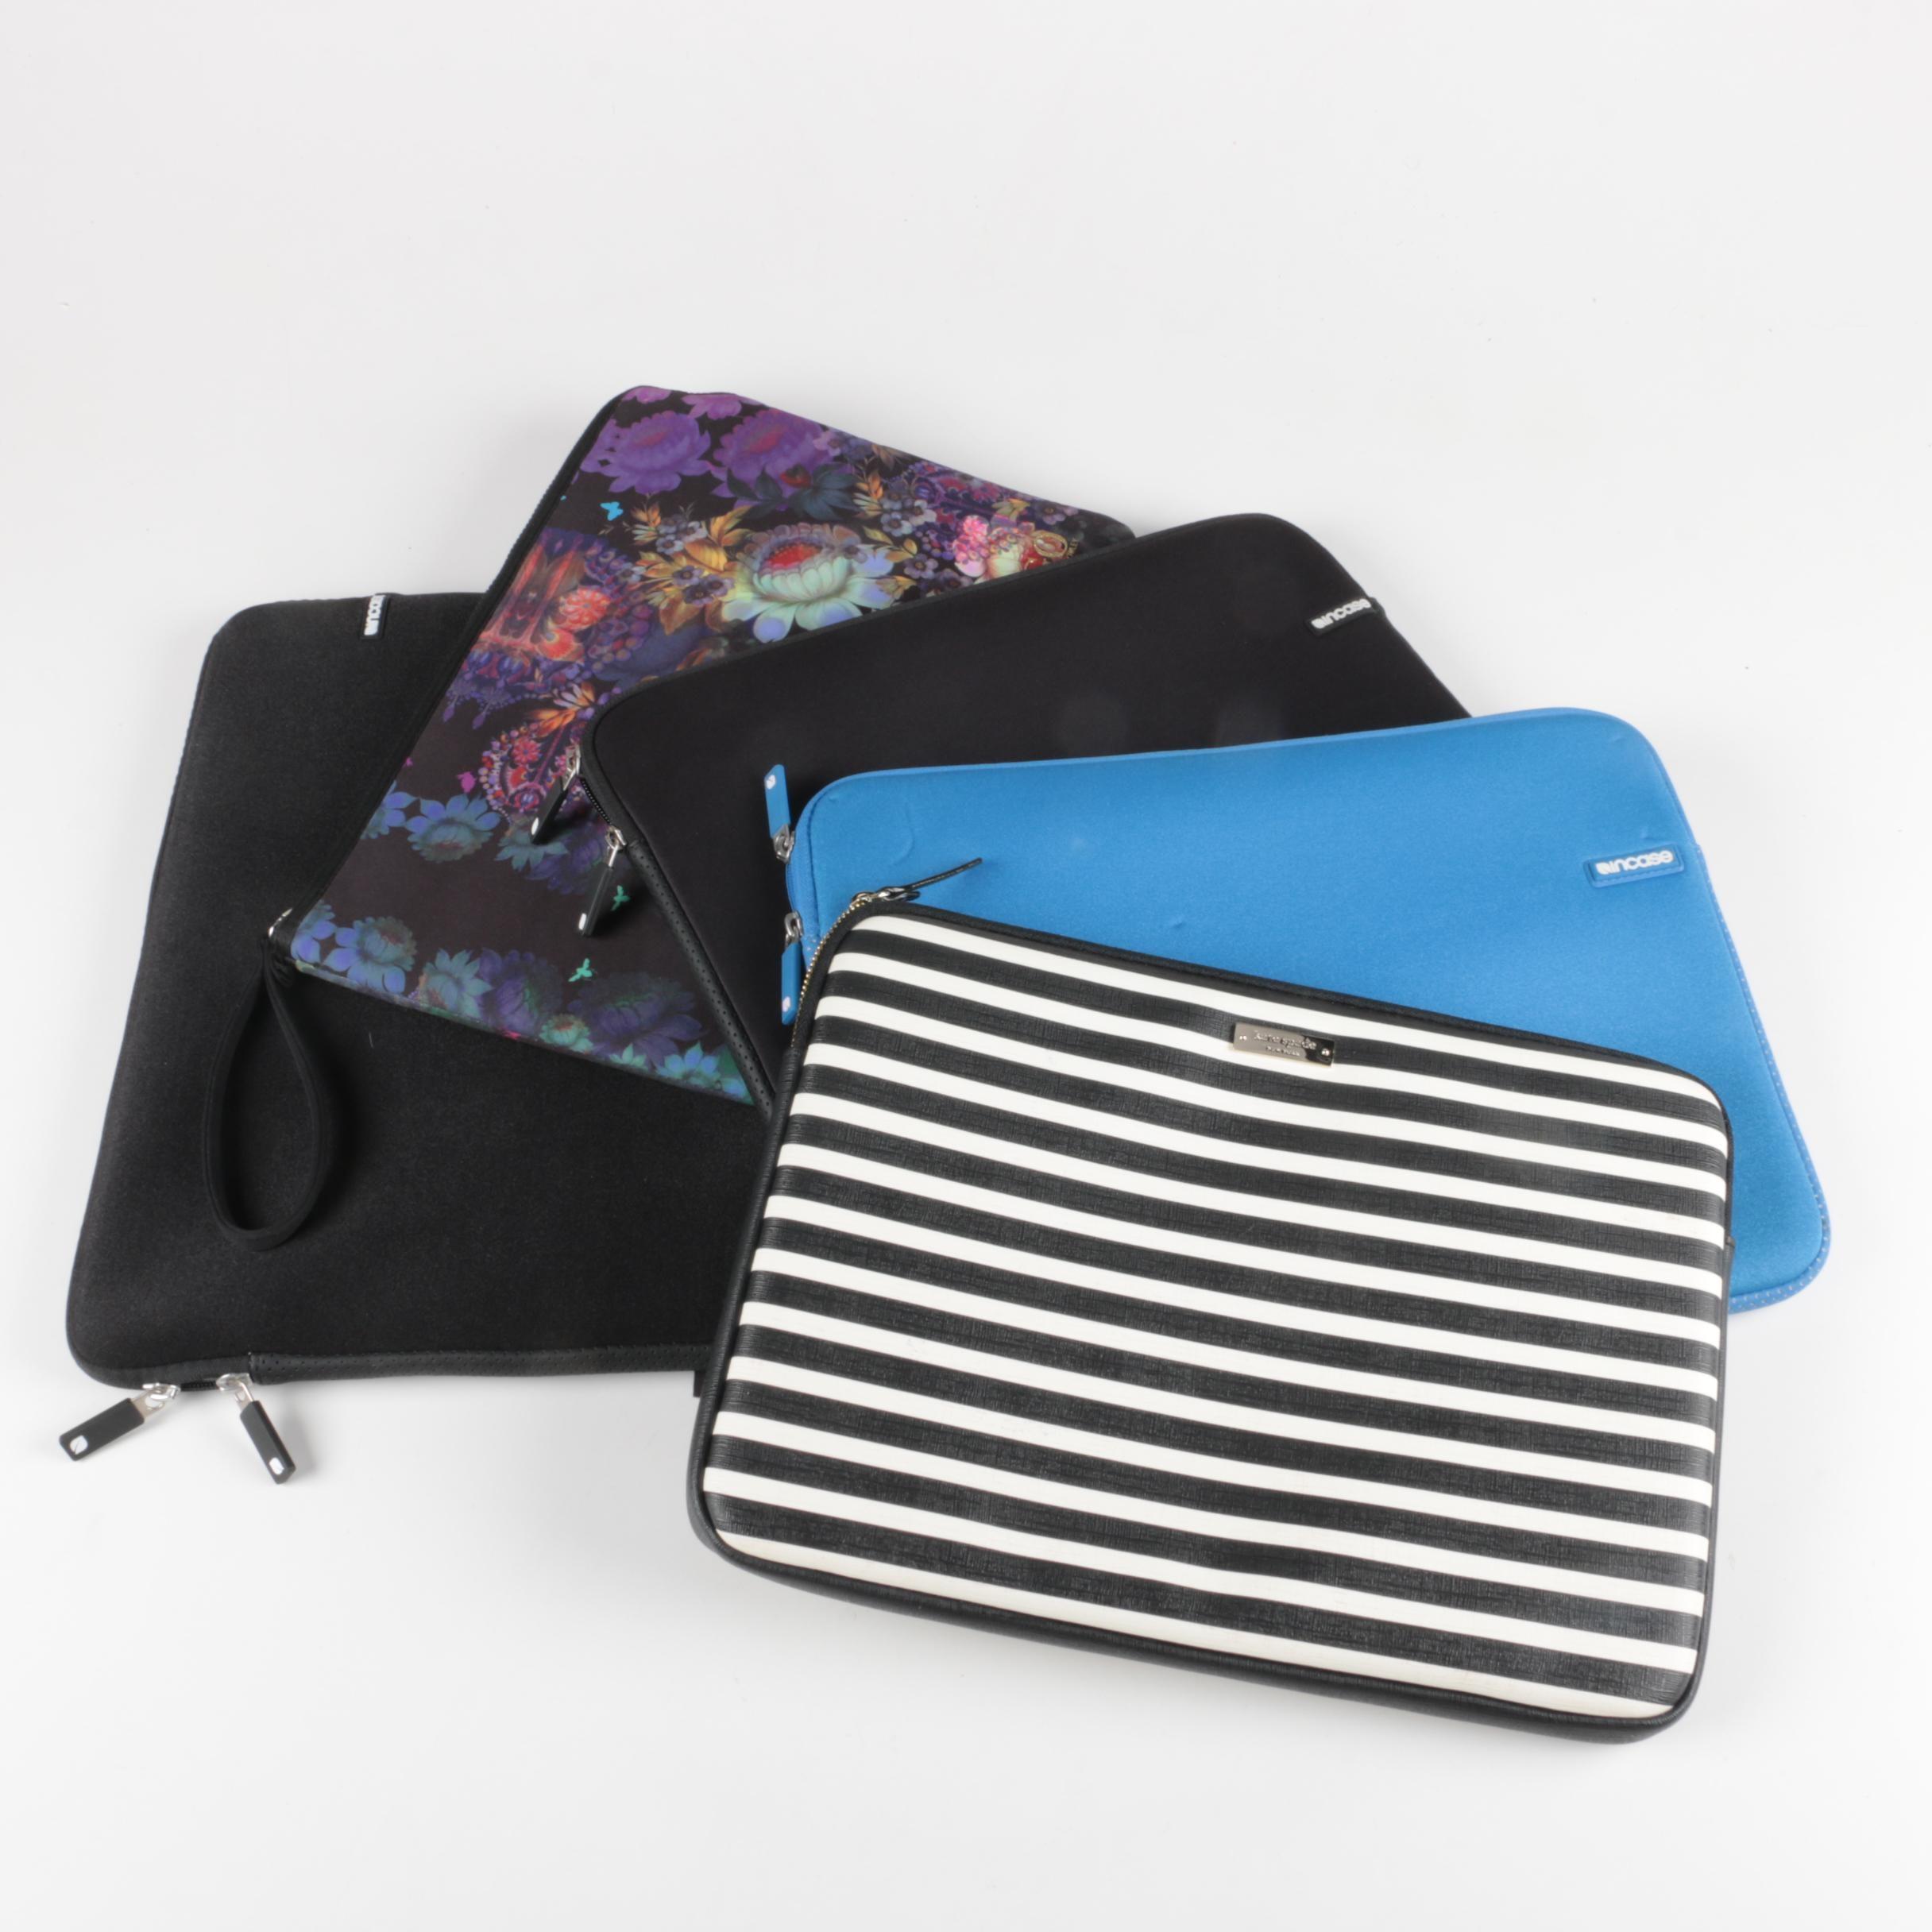 Assortment of Laptop Cases